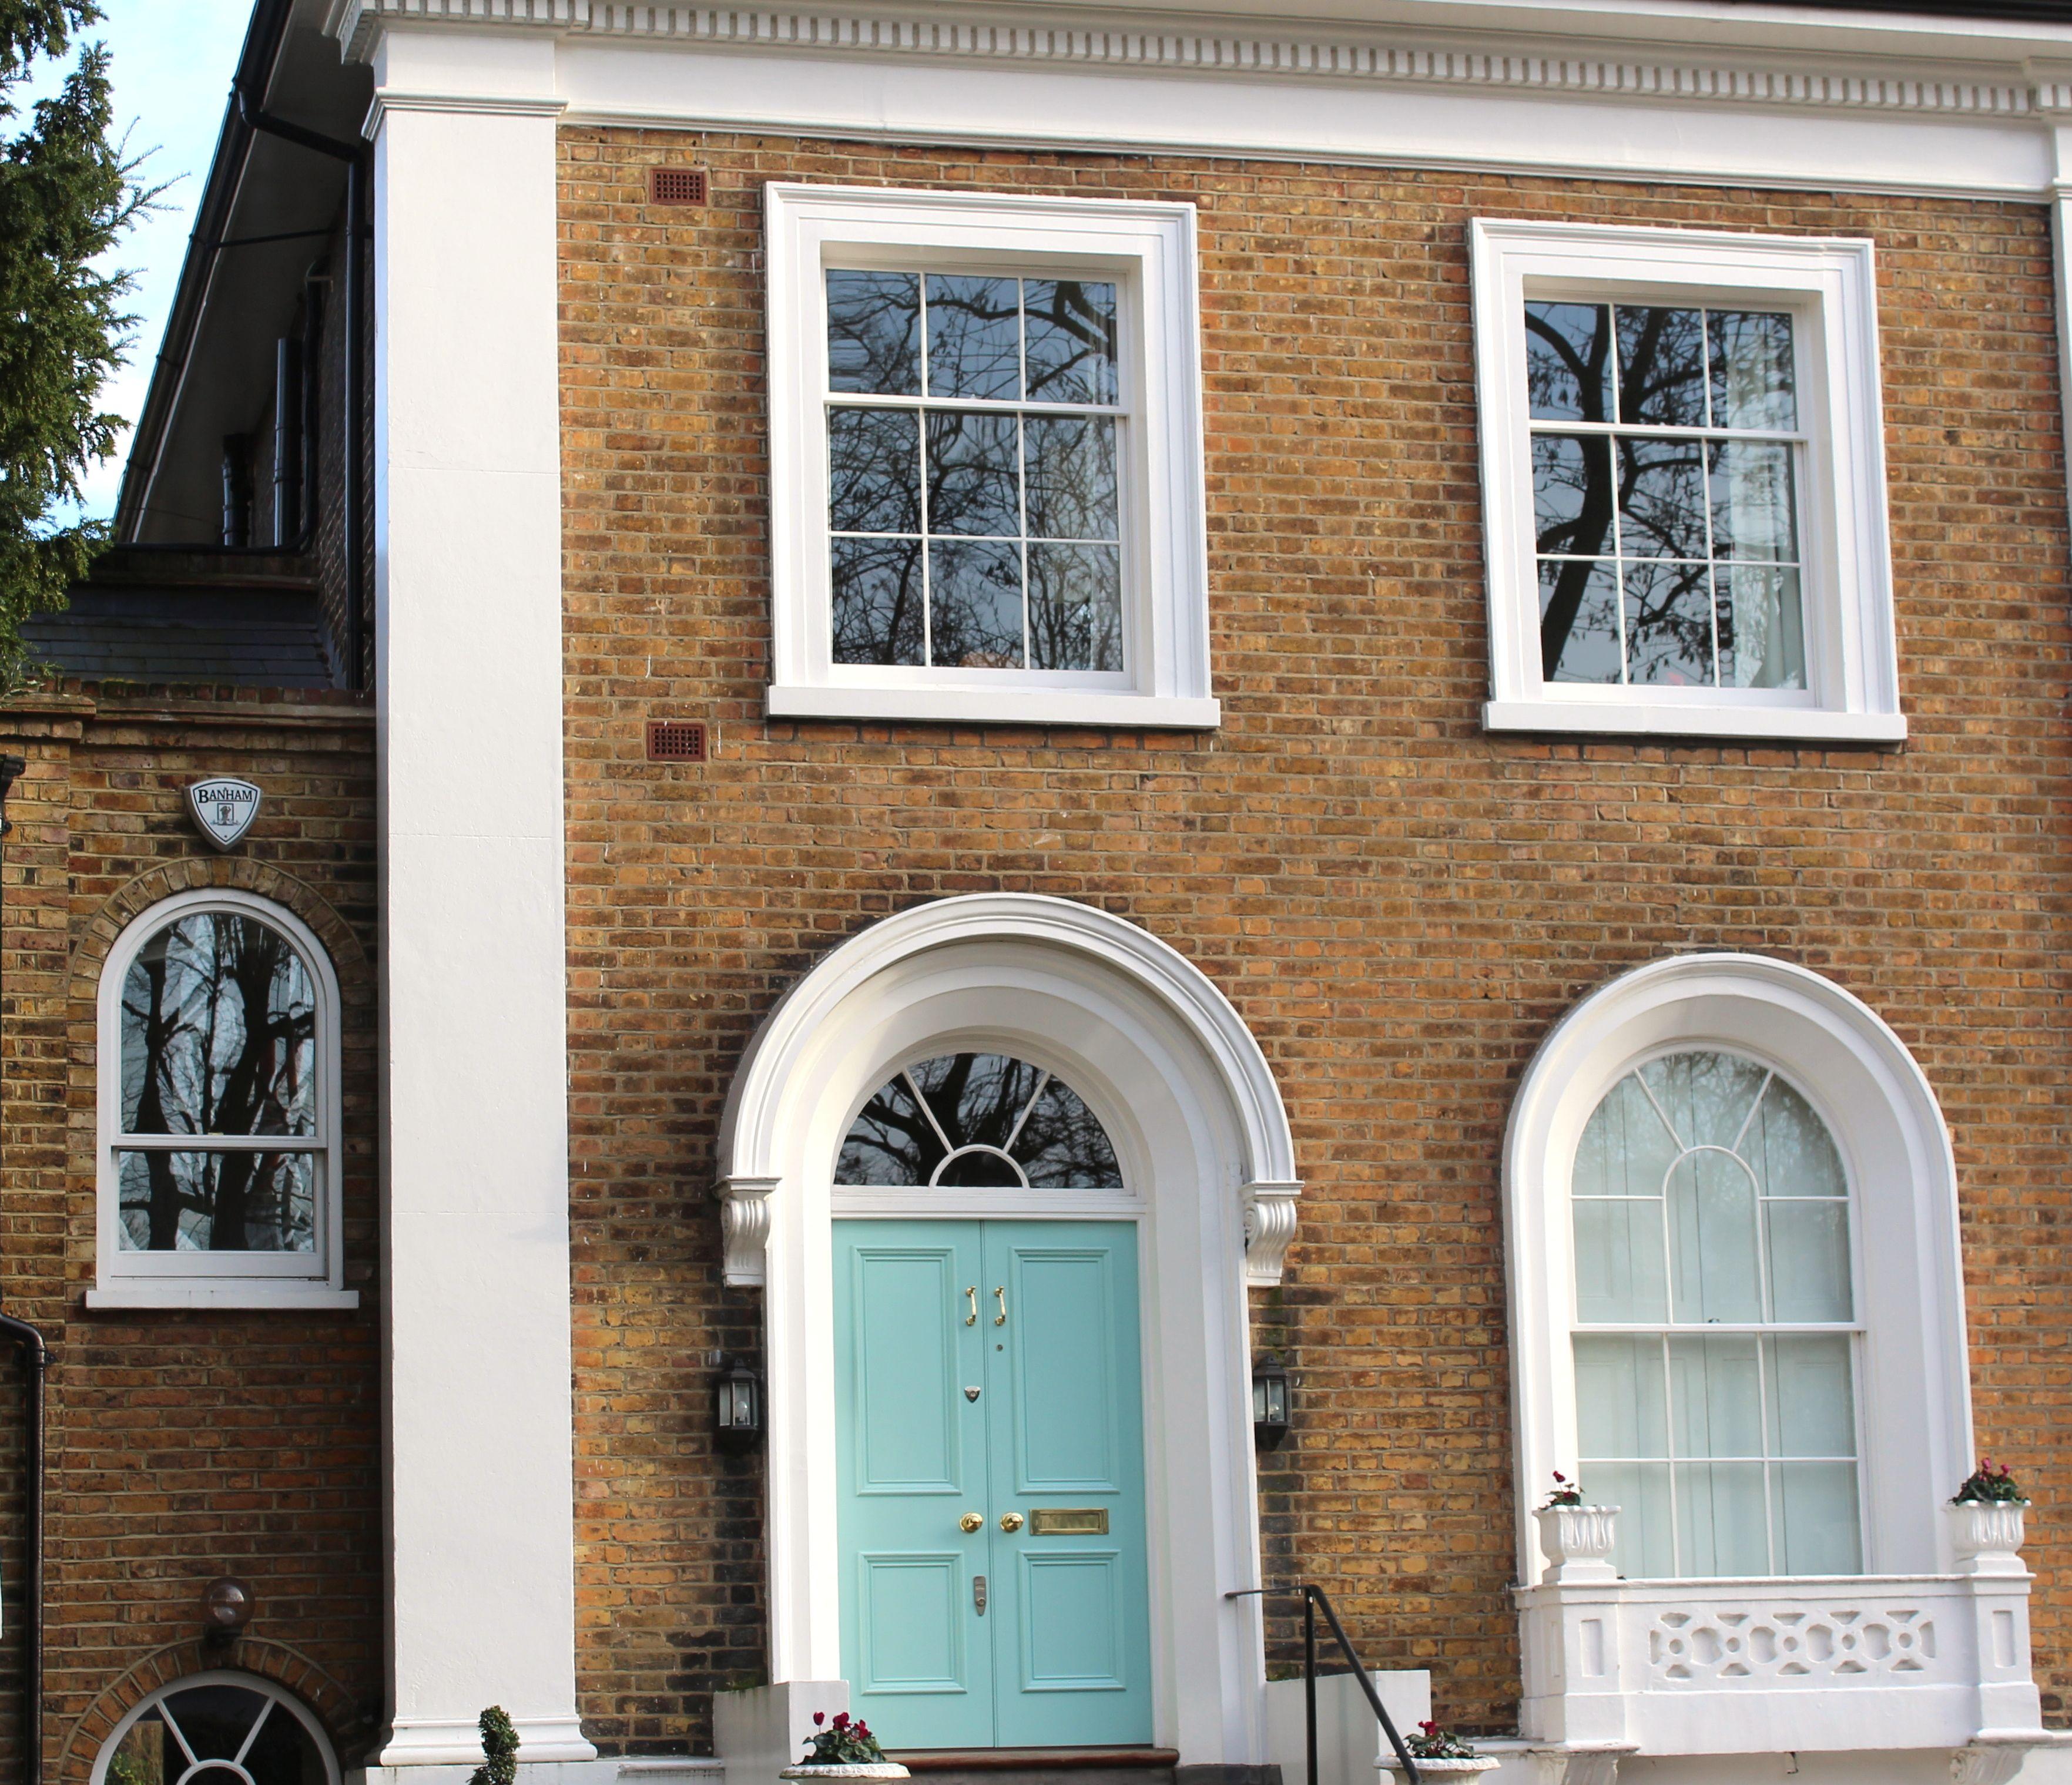 Beautiful Georgian House With Sash Windows Haus Pinterest - Beautiful georgian house in london